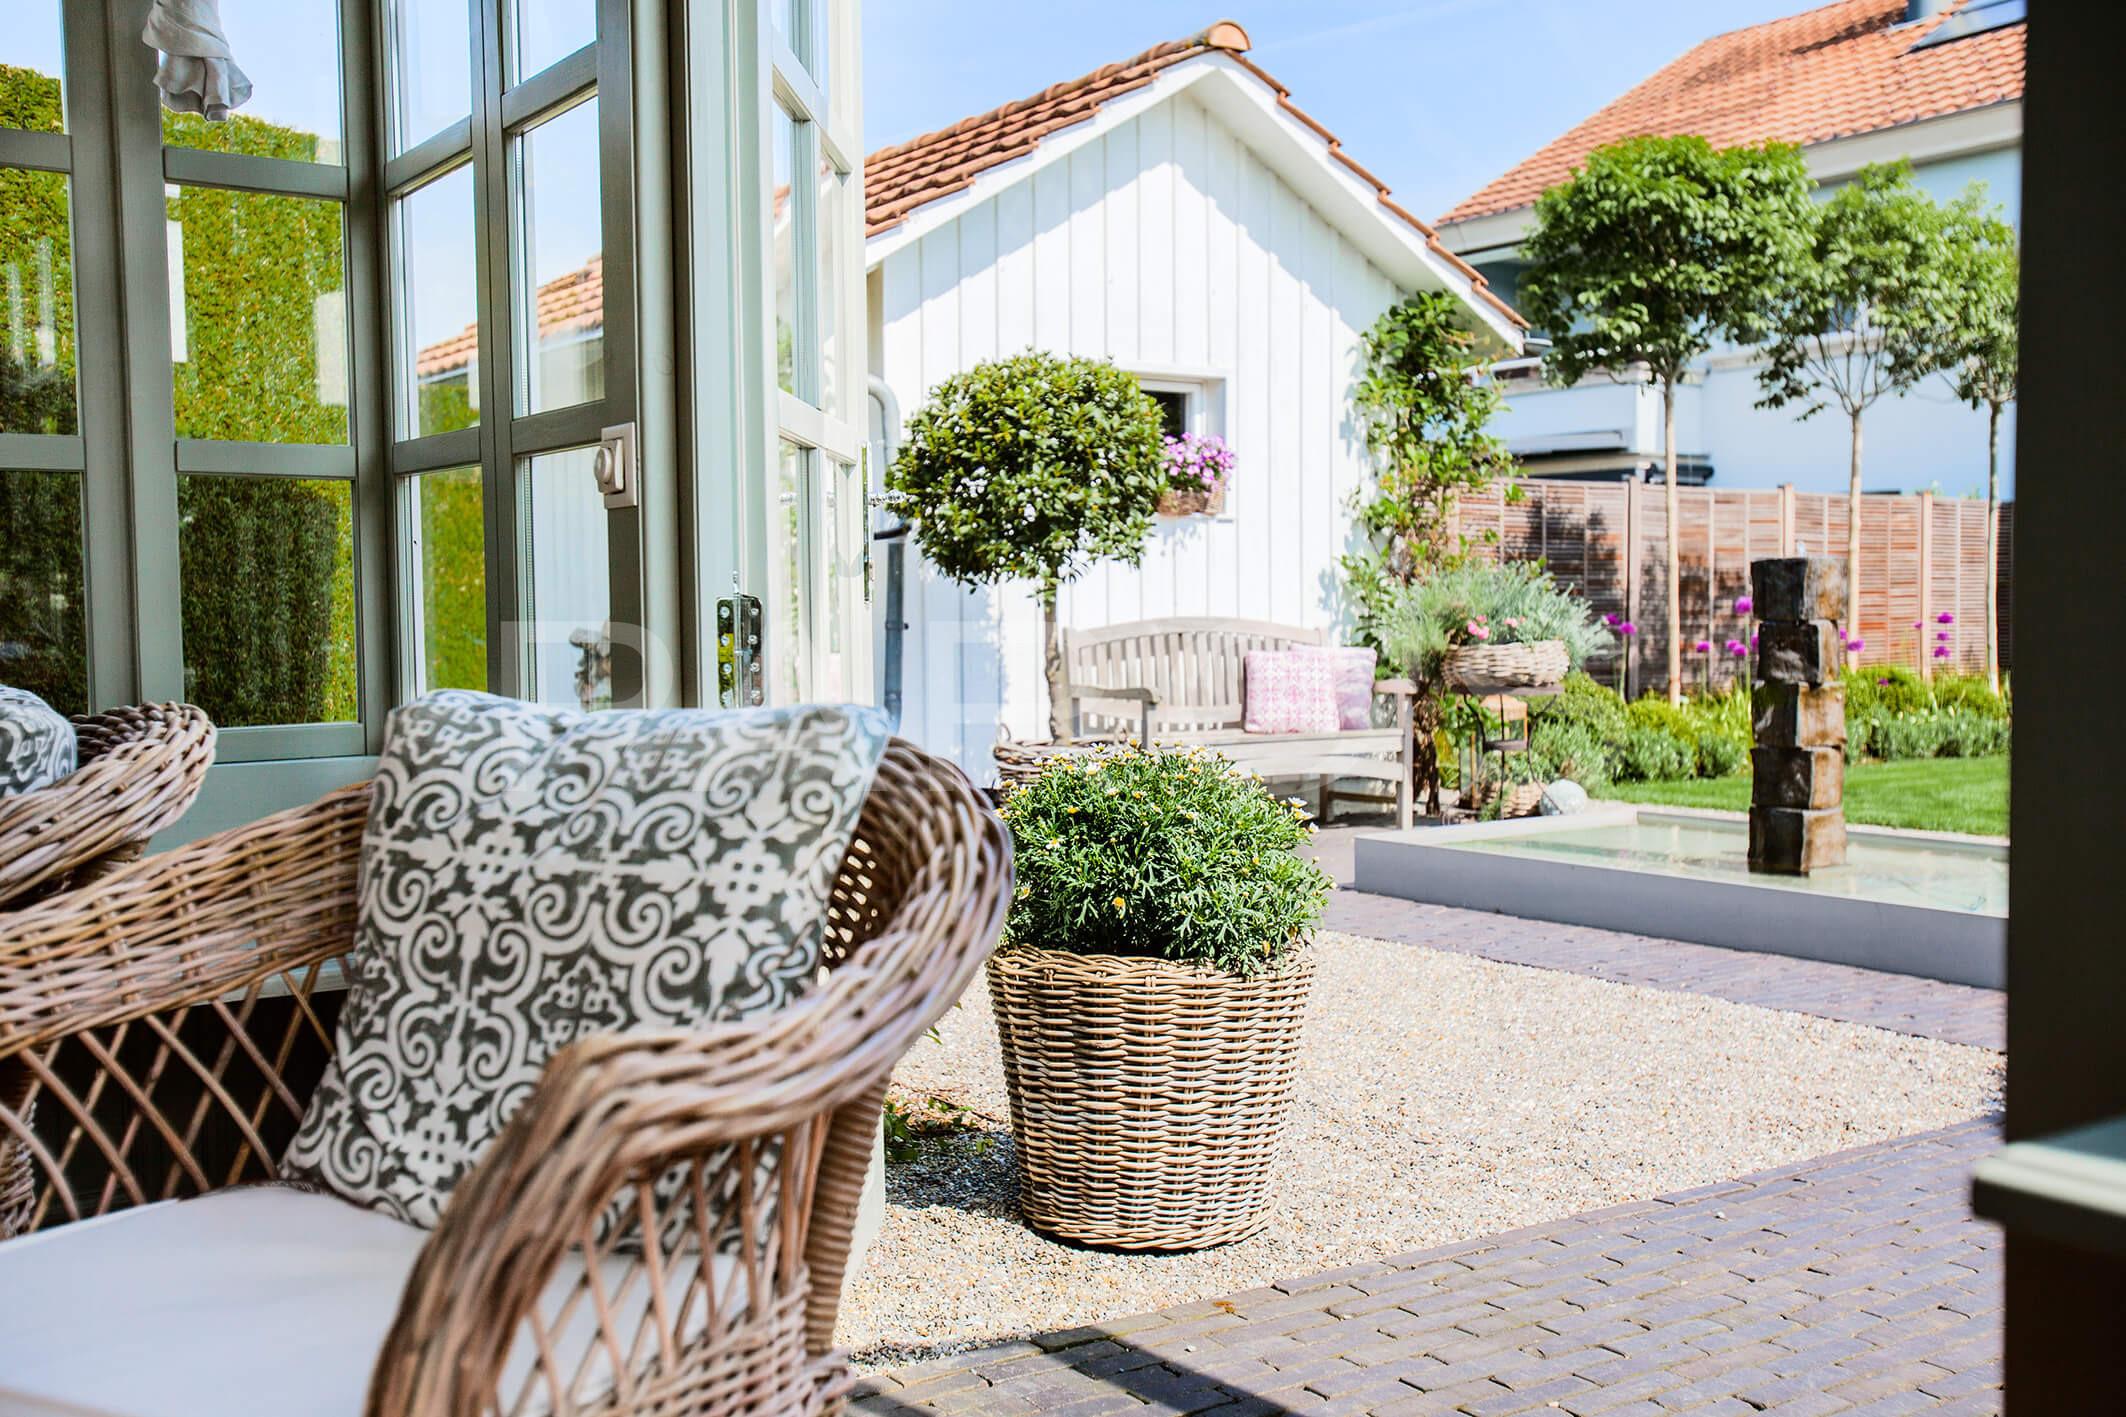 belgisch englischer gartenstil parc 39 s gartengestaltung. Black Bedroom Furniture Sets. Home Design Ideas